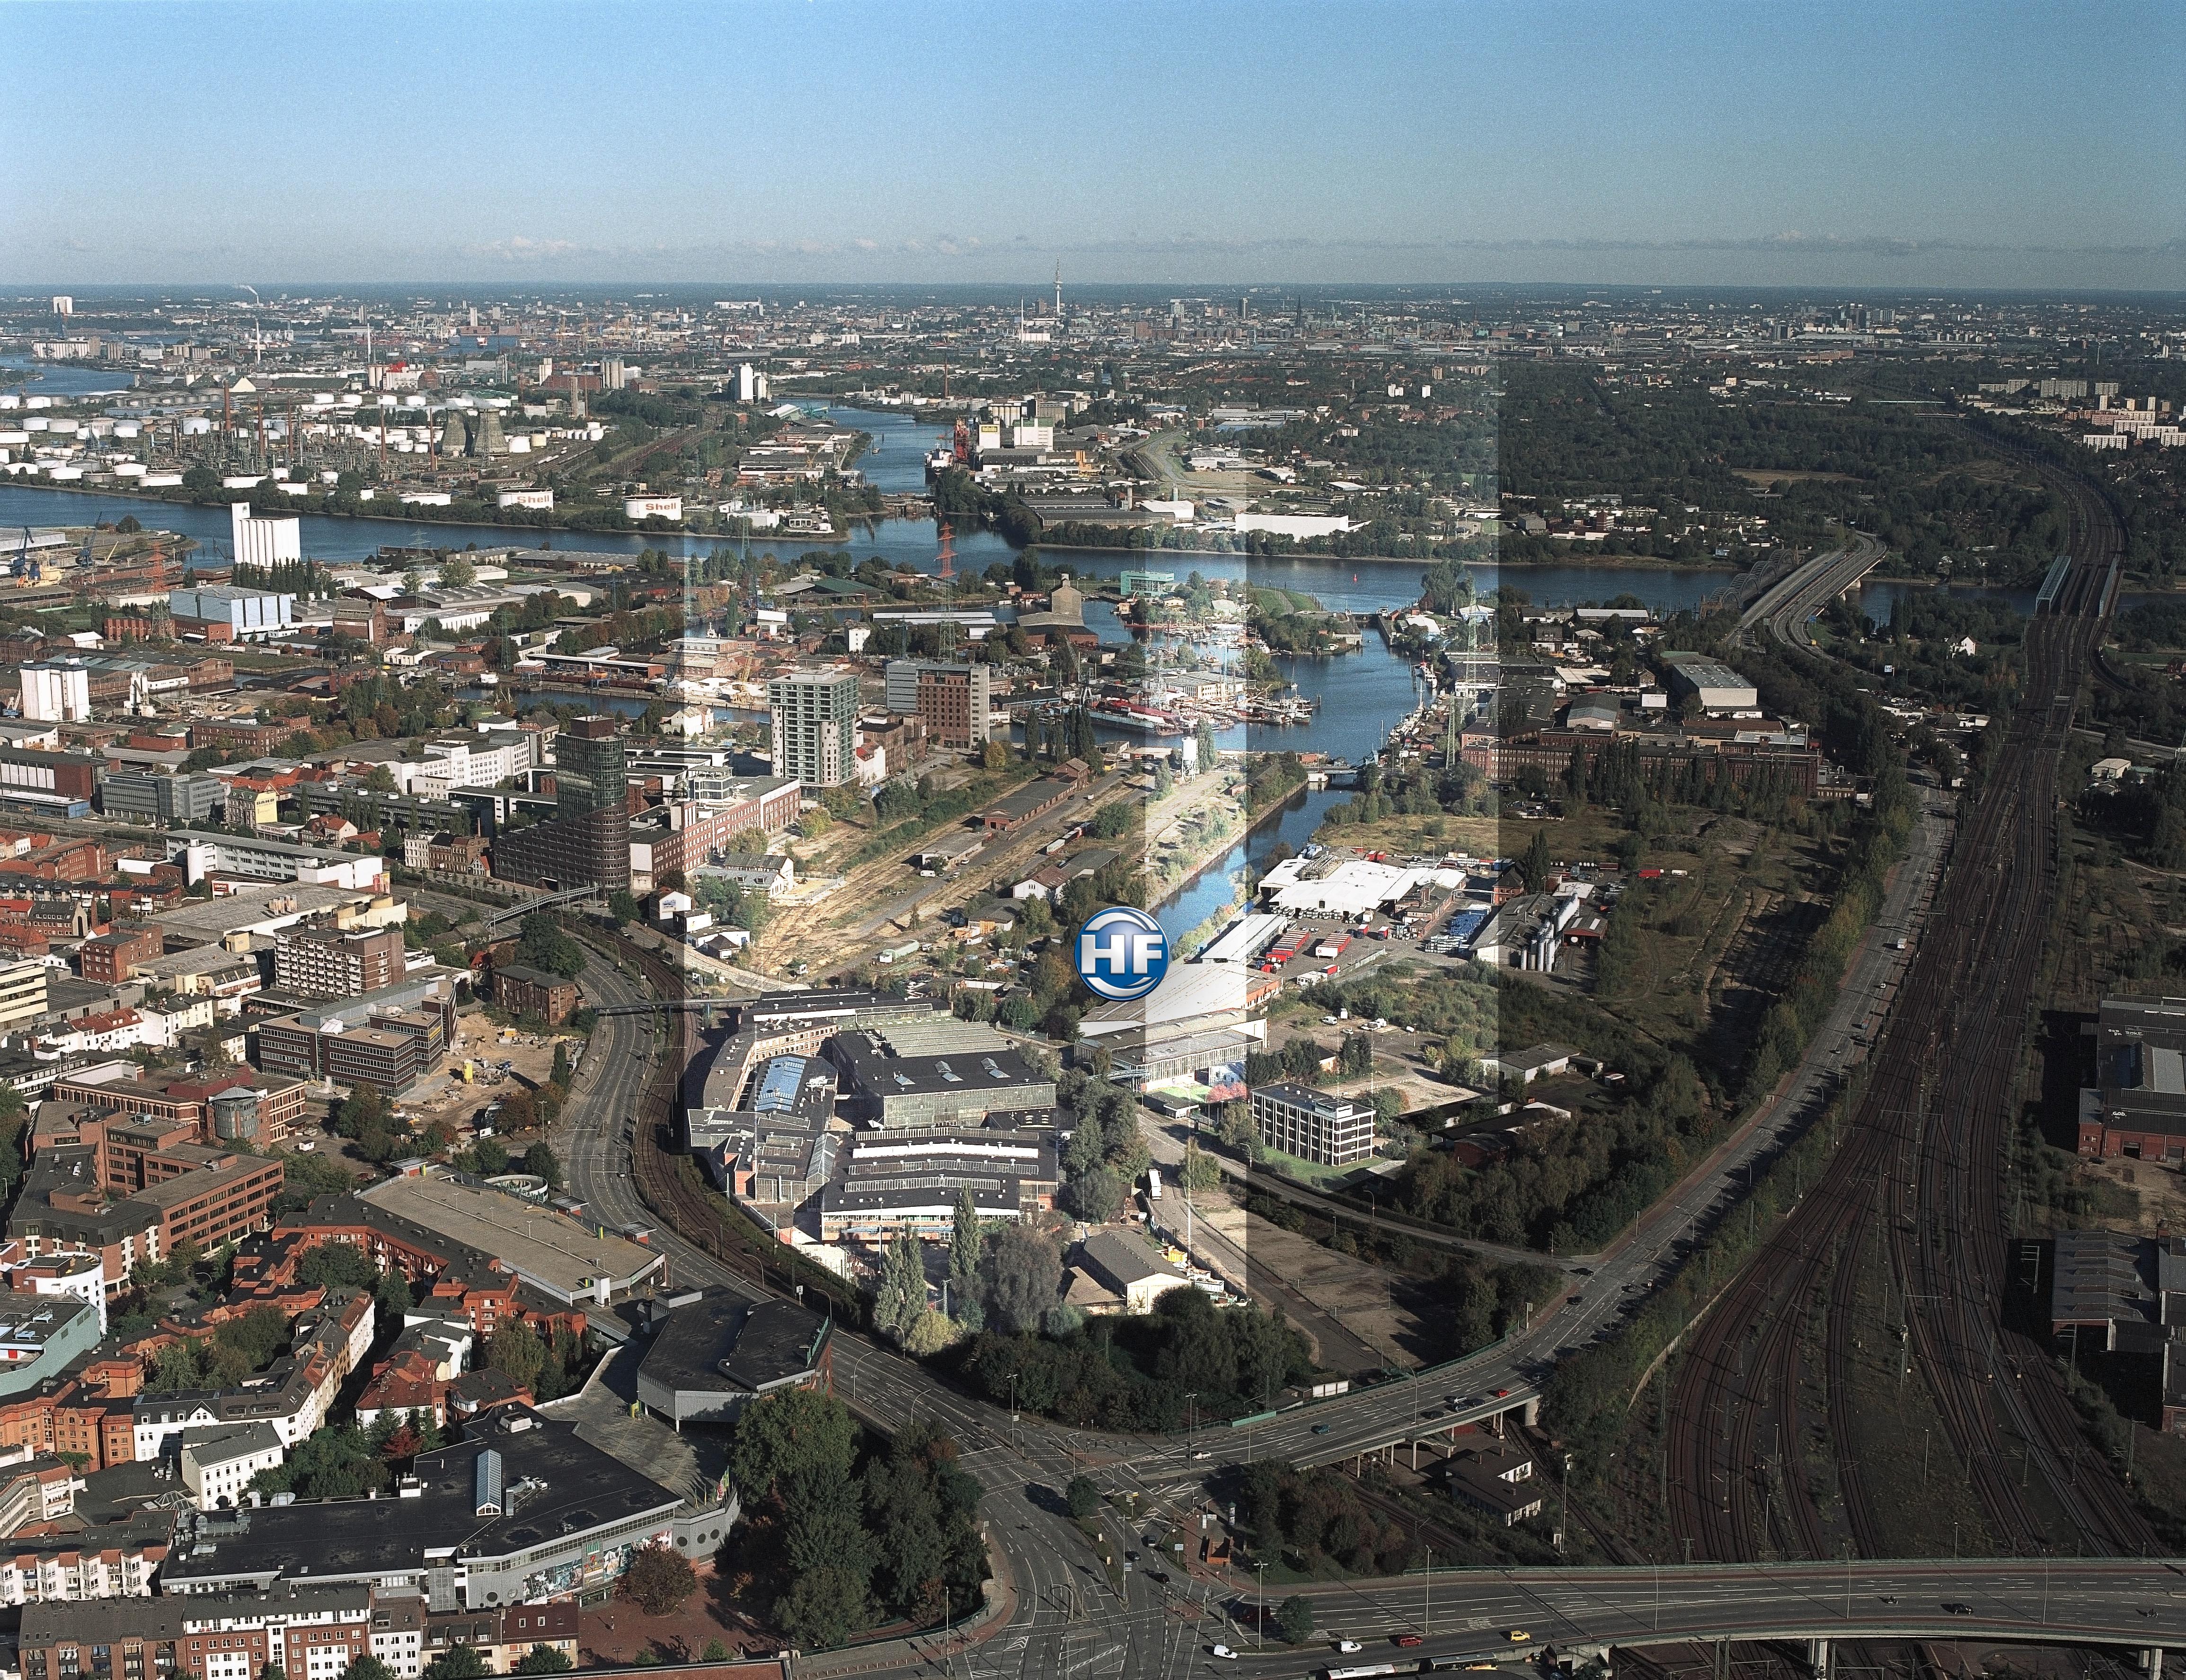 File Luftbild Hamburg Harburg Hf Jpg Wikimedia Commons